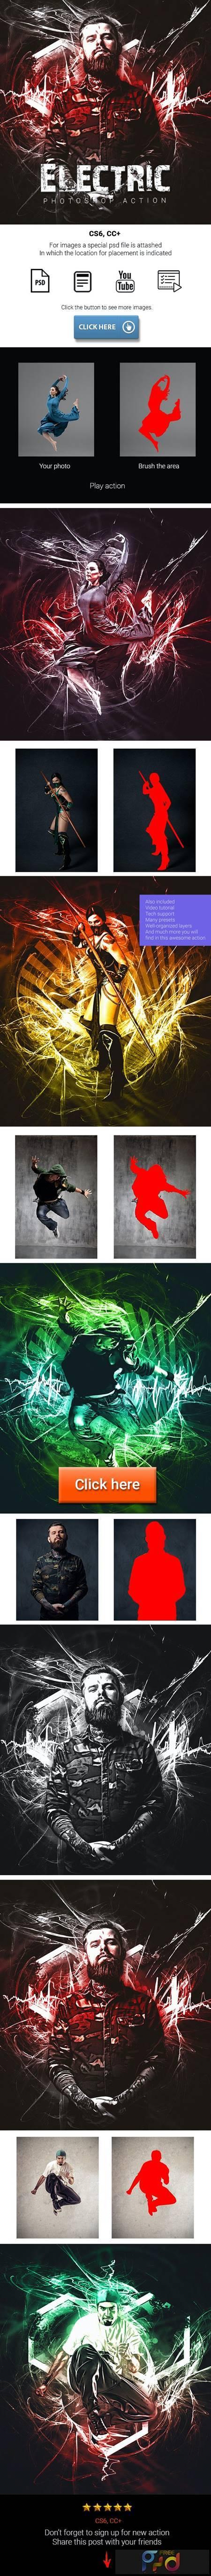 Electric Photoshop Action 26318095 1